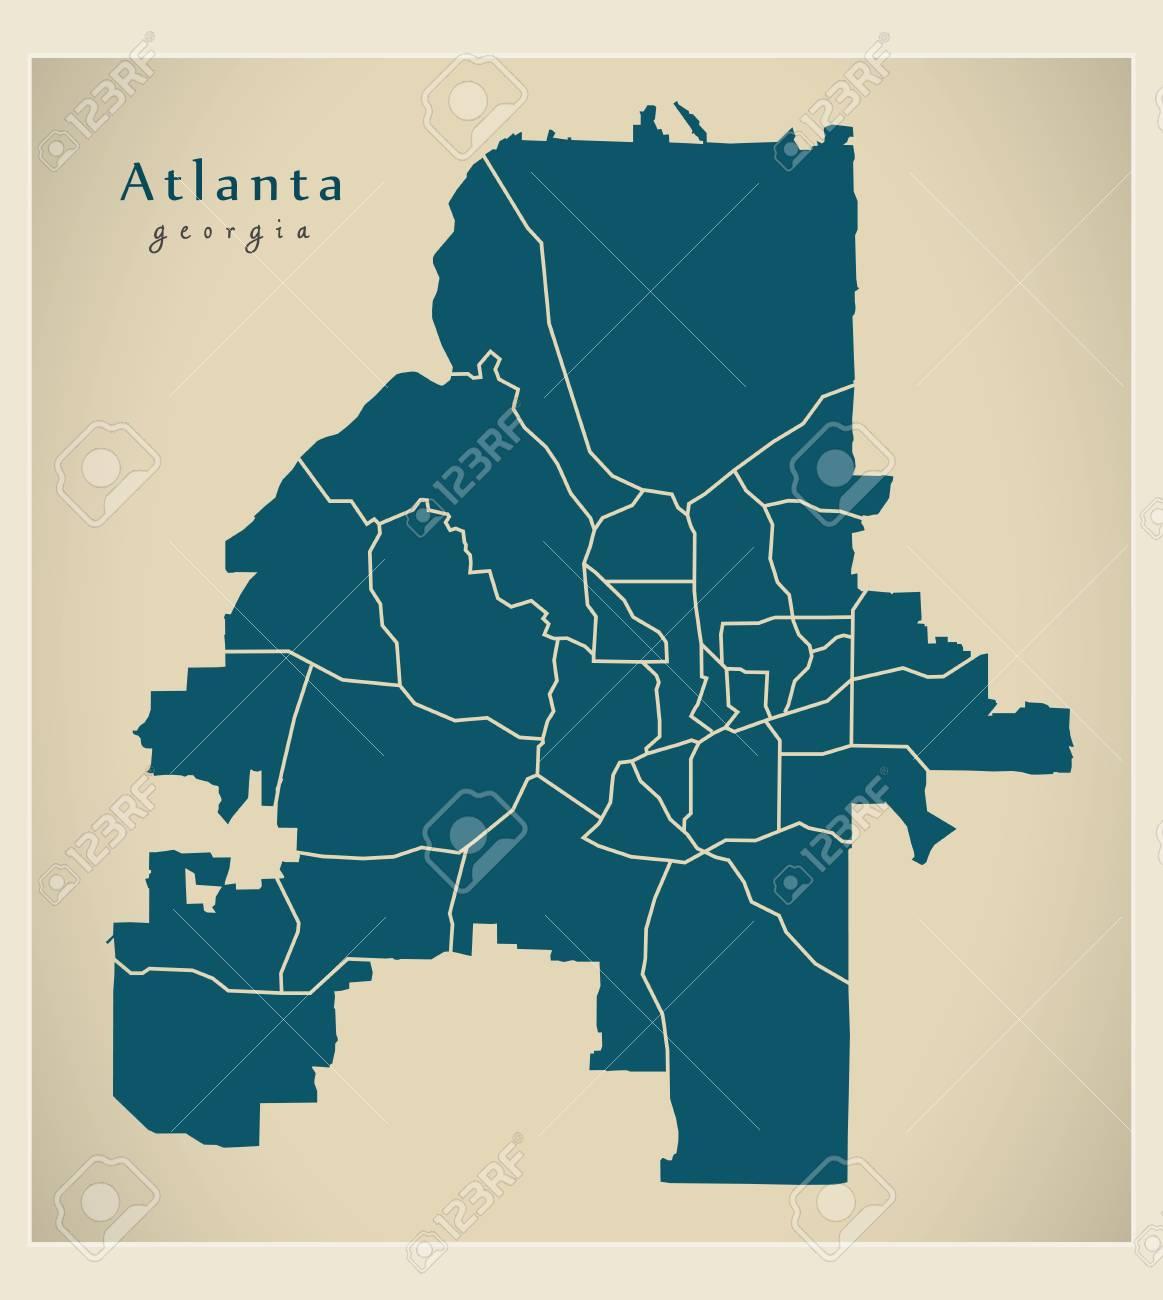 Where Is Atlanta Georgia On The Map Of Usa.Modern City Map Atlanta Georgia City Of The Usa With Neighborhoods